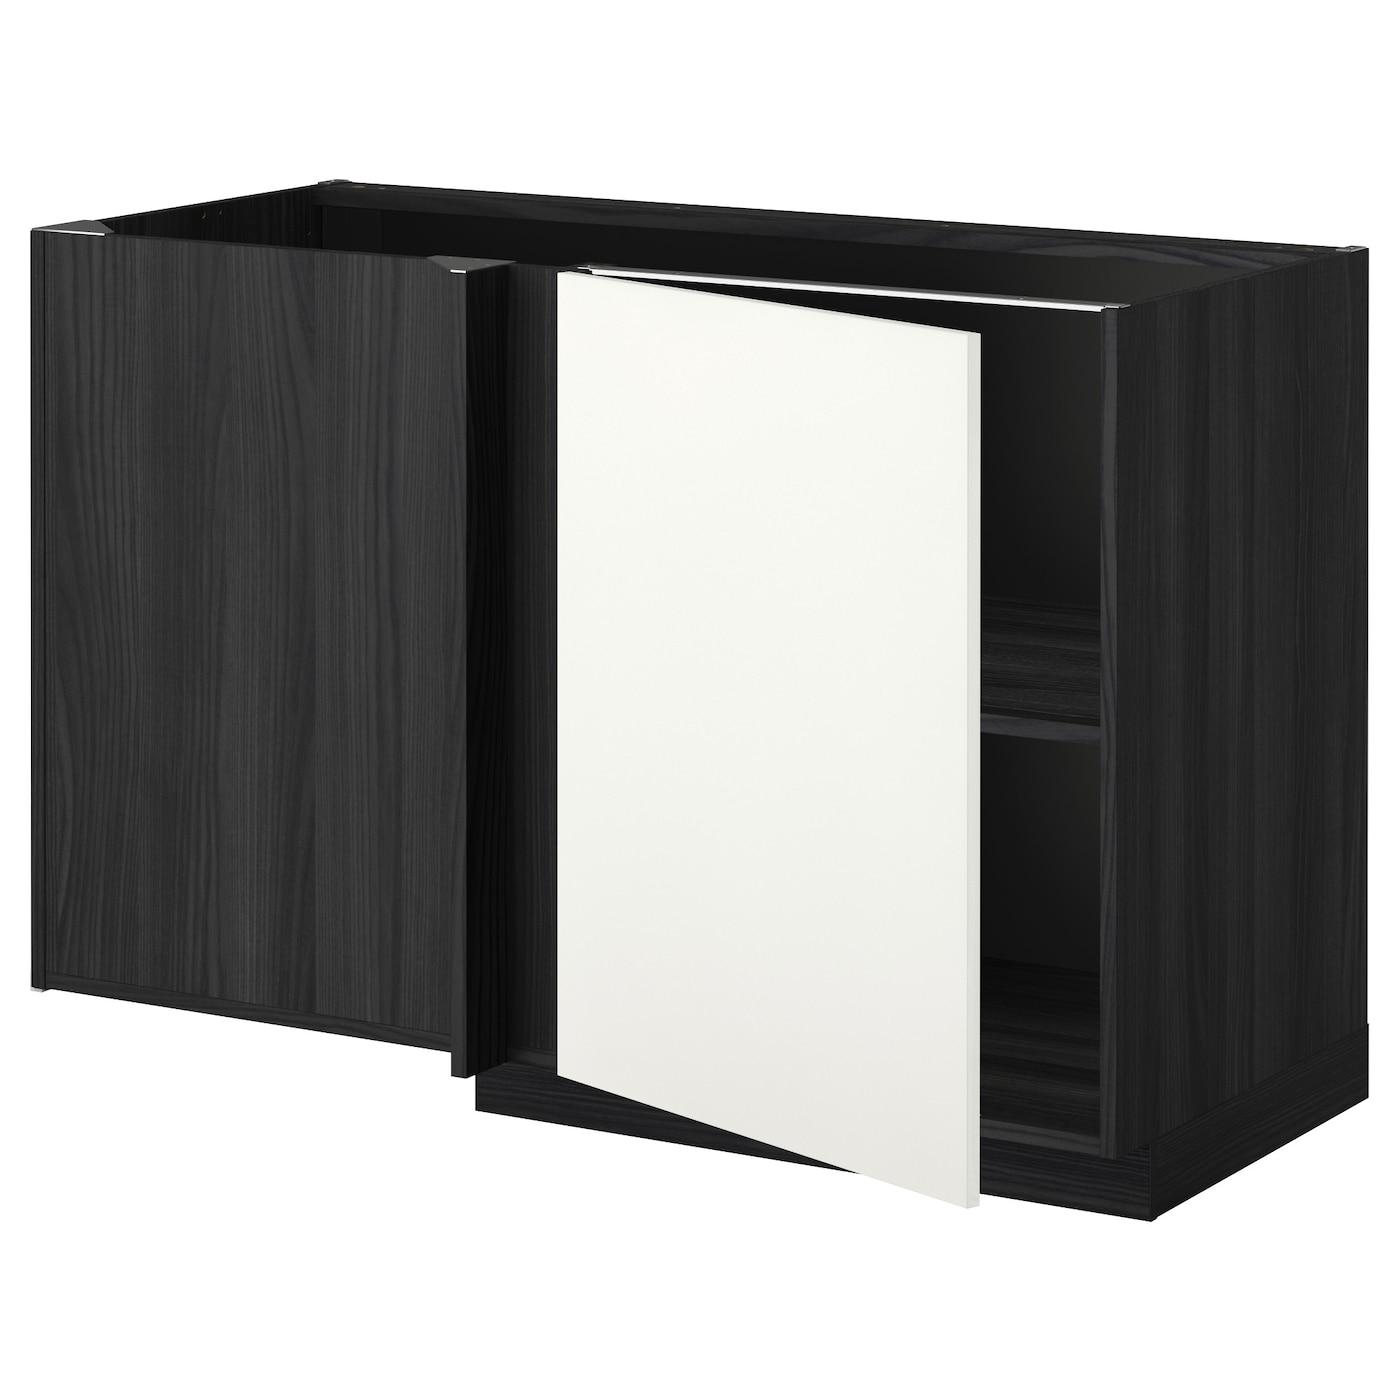 METOD Corner Base Cabinet With Shelf Black/häggeby White 128x68 Cm